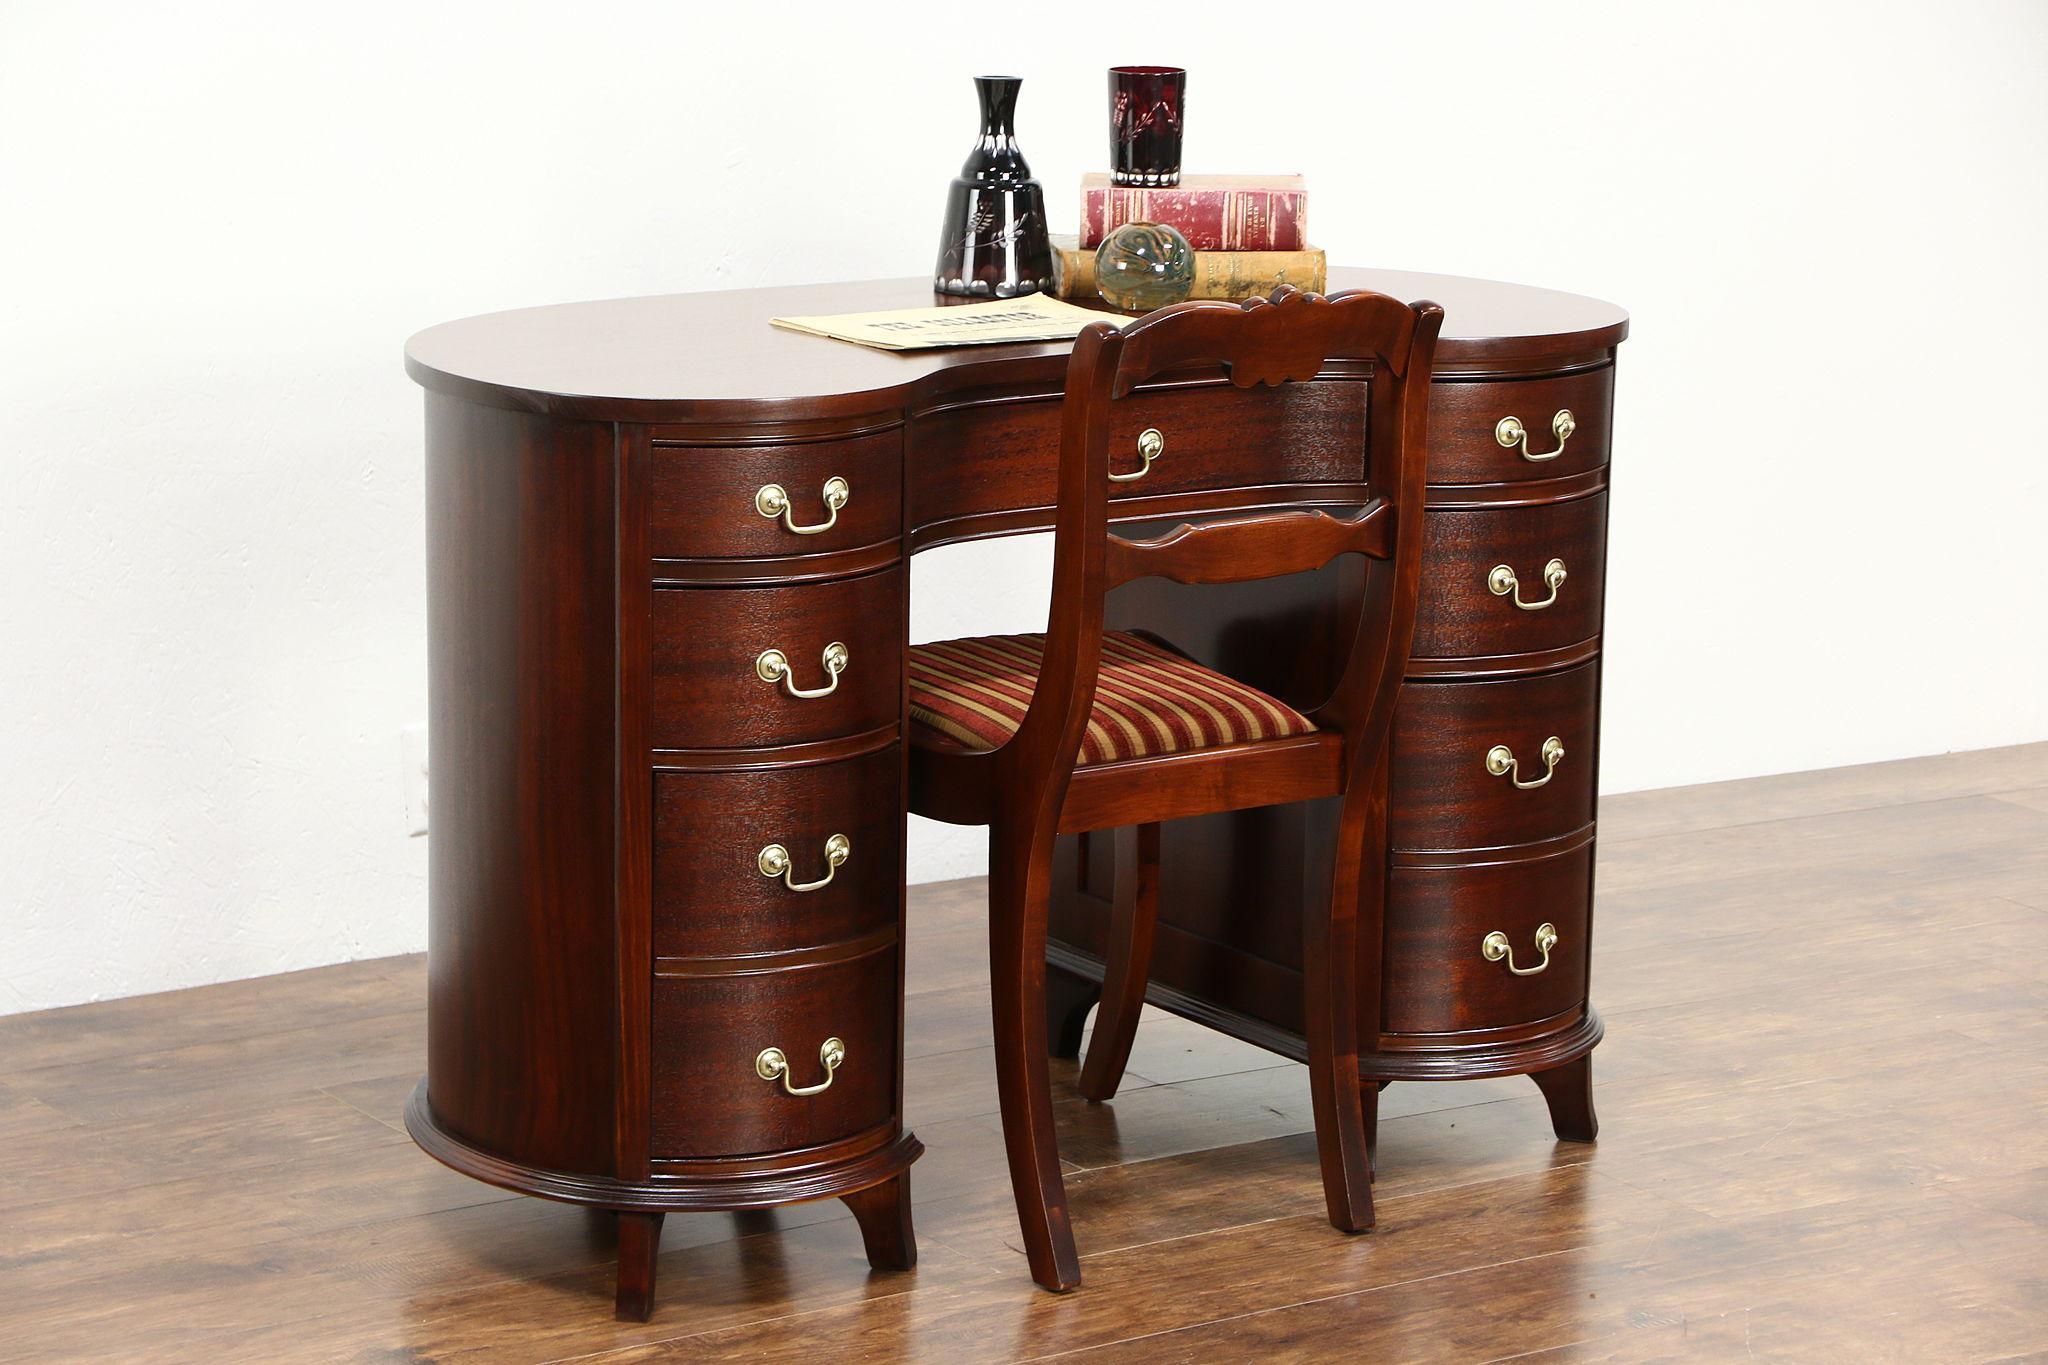 Gany 1950 Vintage Kidney Desk Chair Library Set